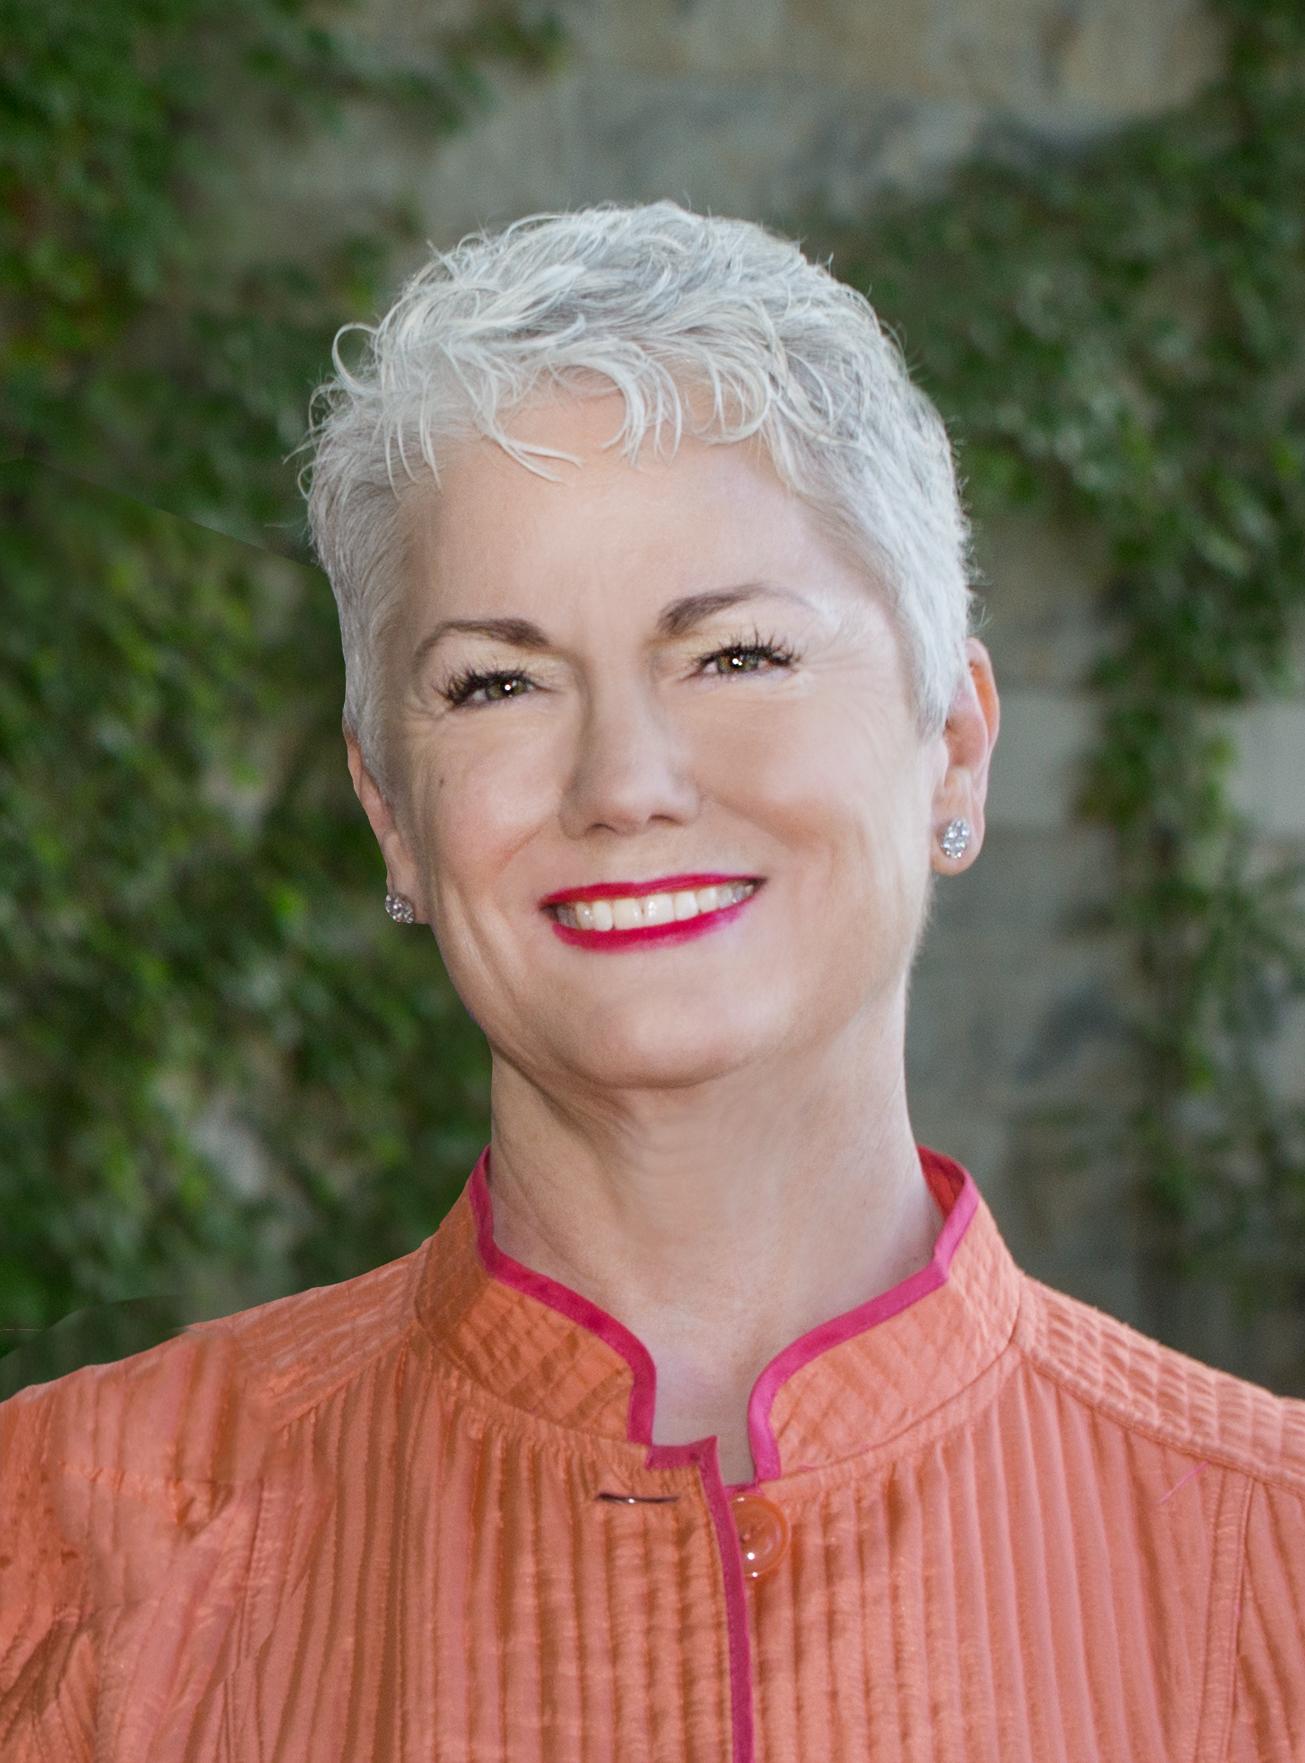 Diana Milock